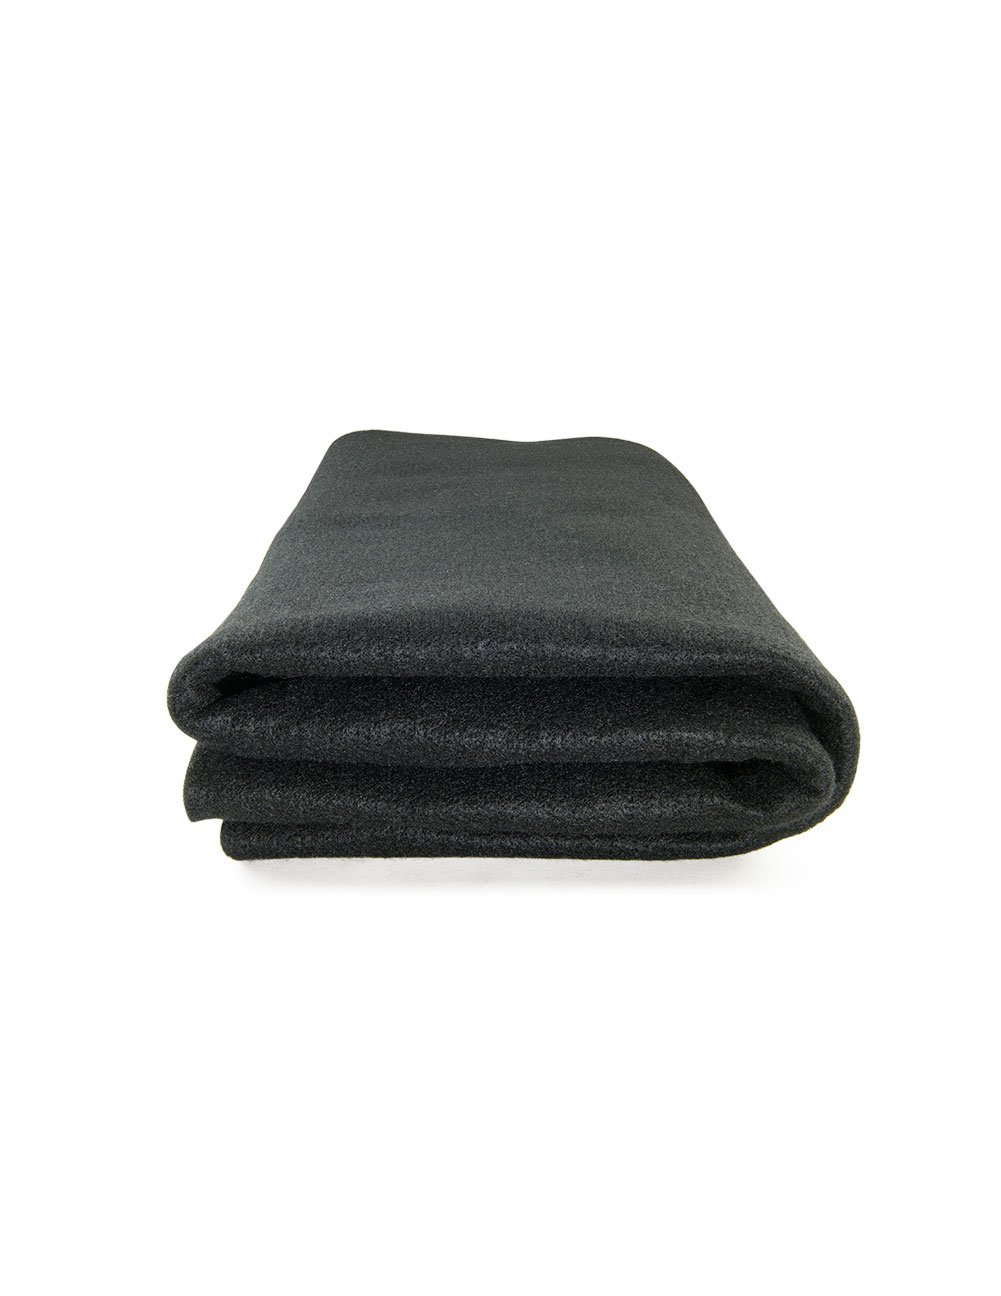 High Temp Felt Welding Blanket: 6' X 4', Black by The Felt Store